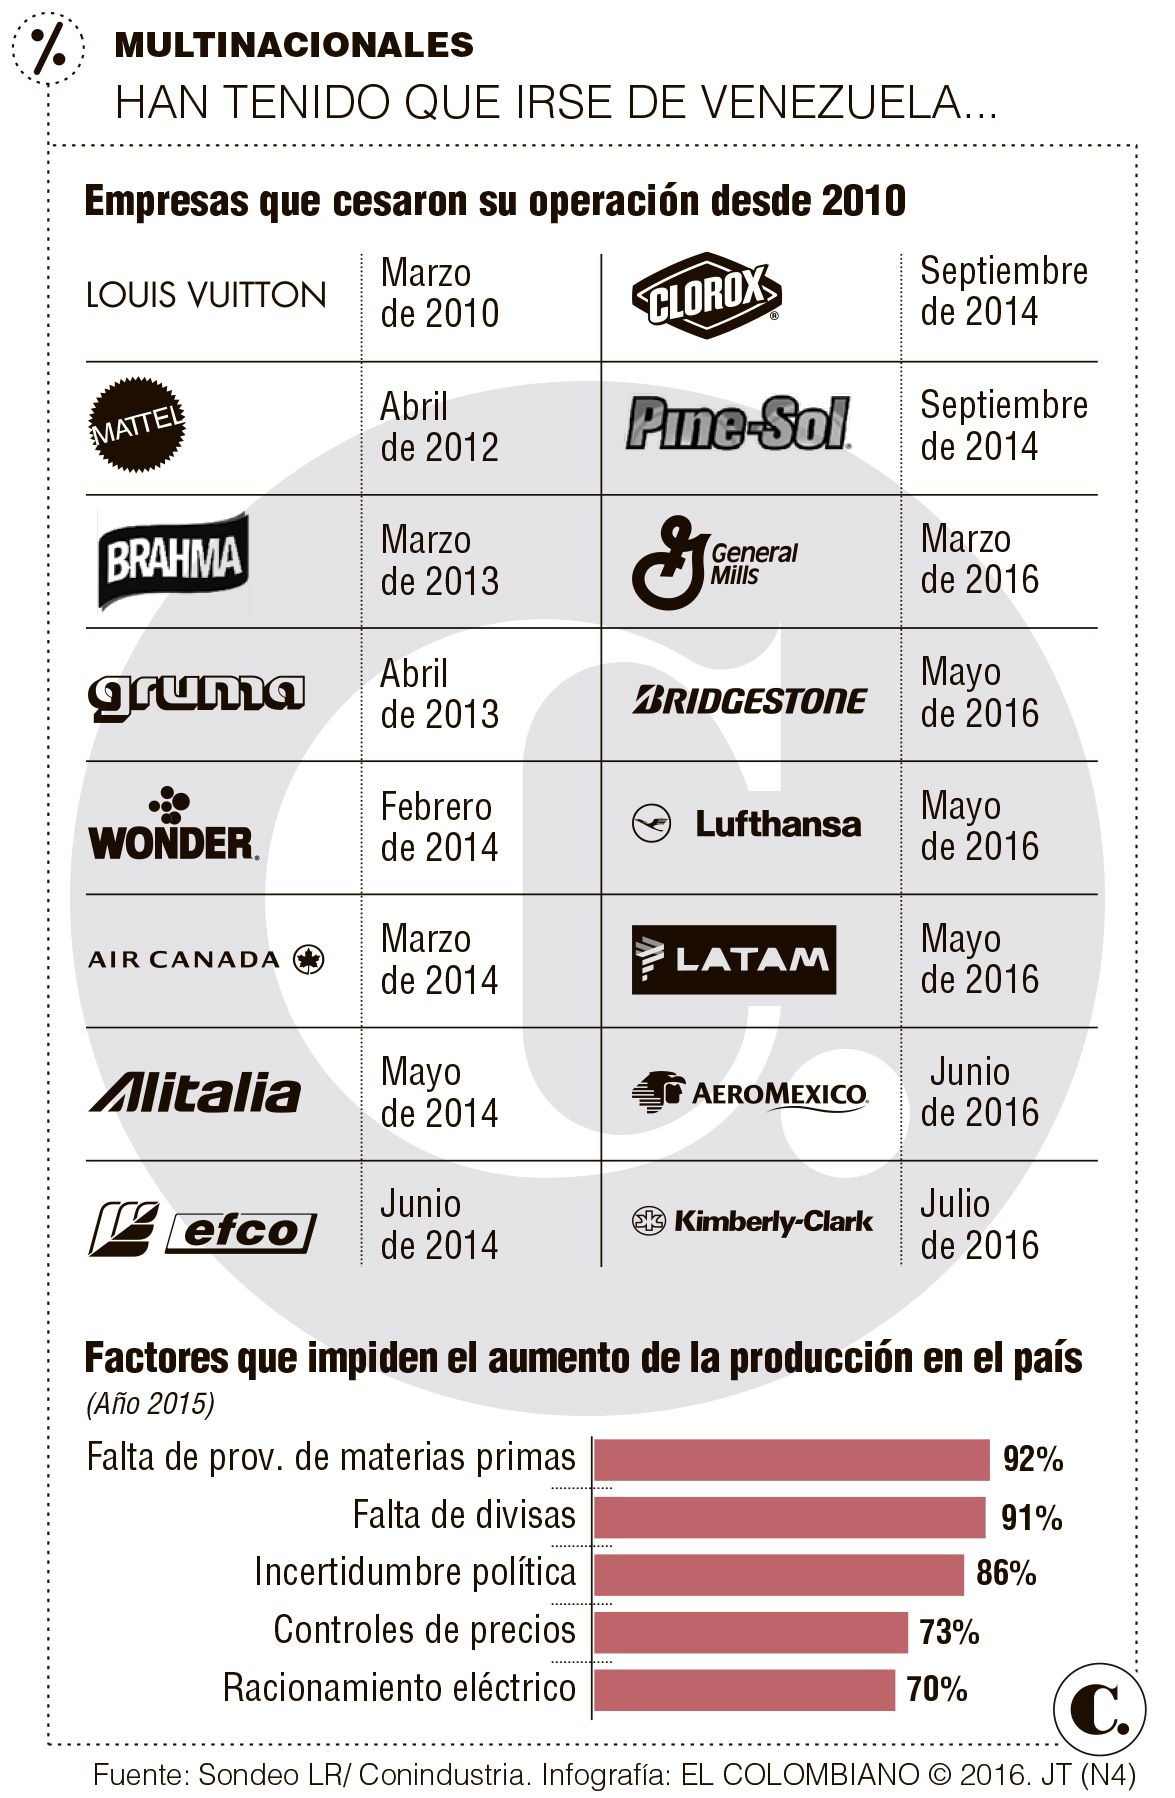 Crisis en Venezuela: ocupan planta de Kimberly